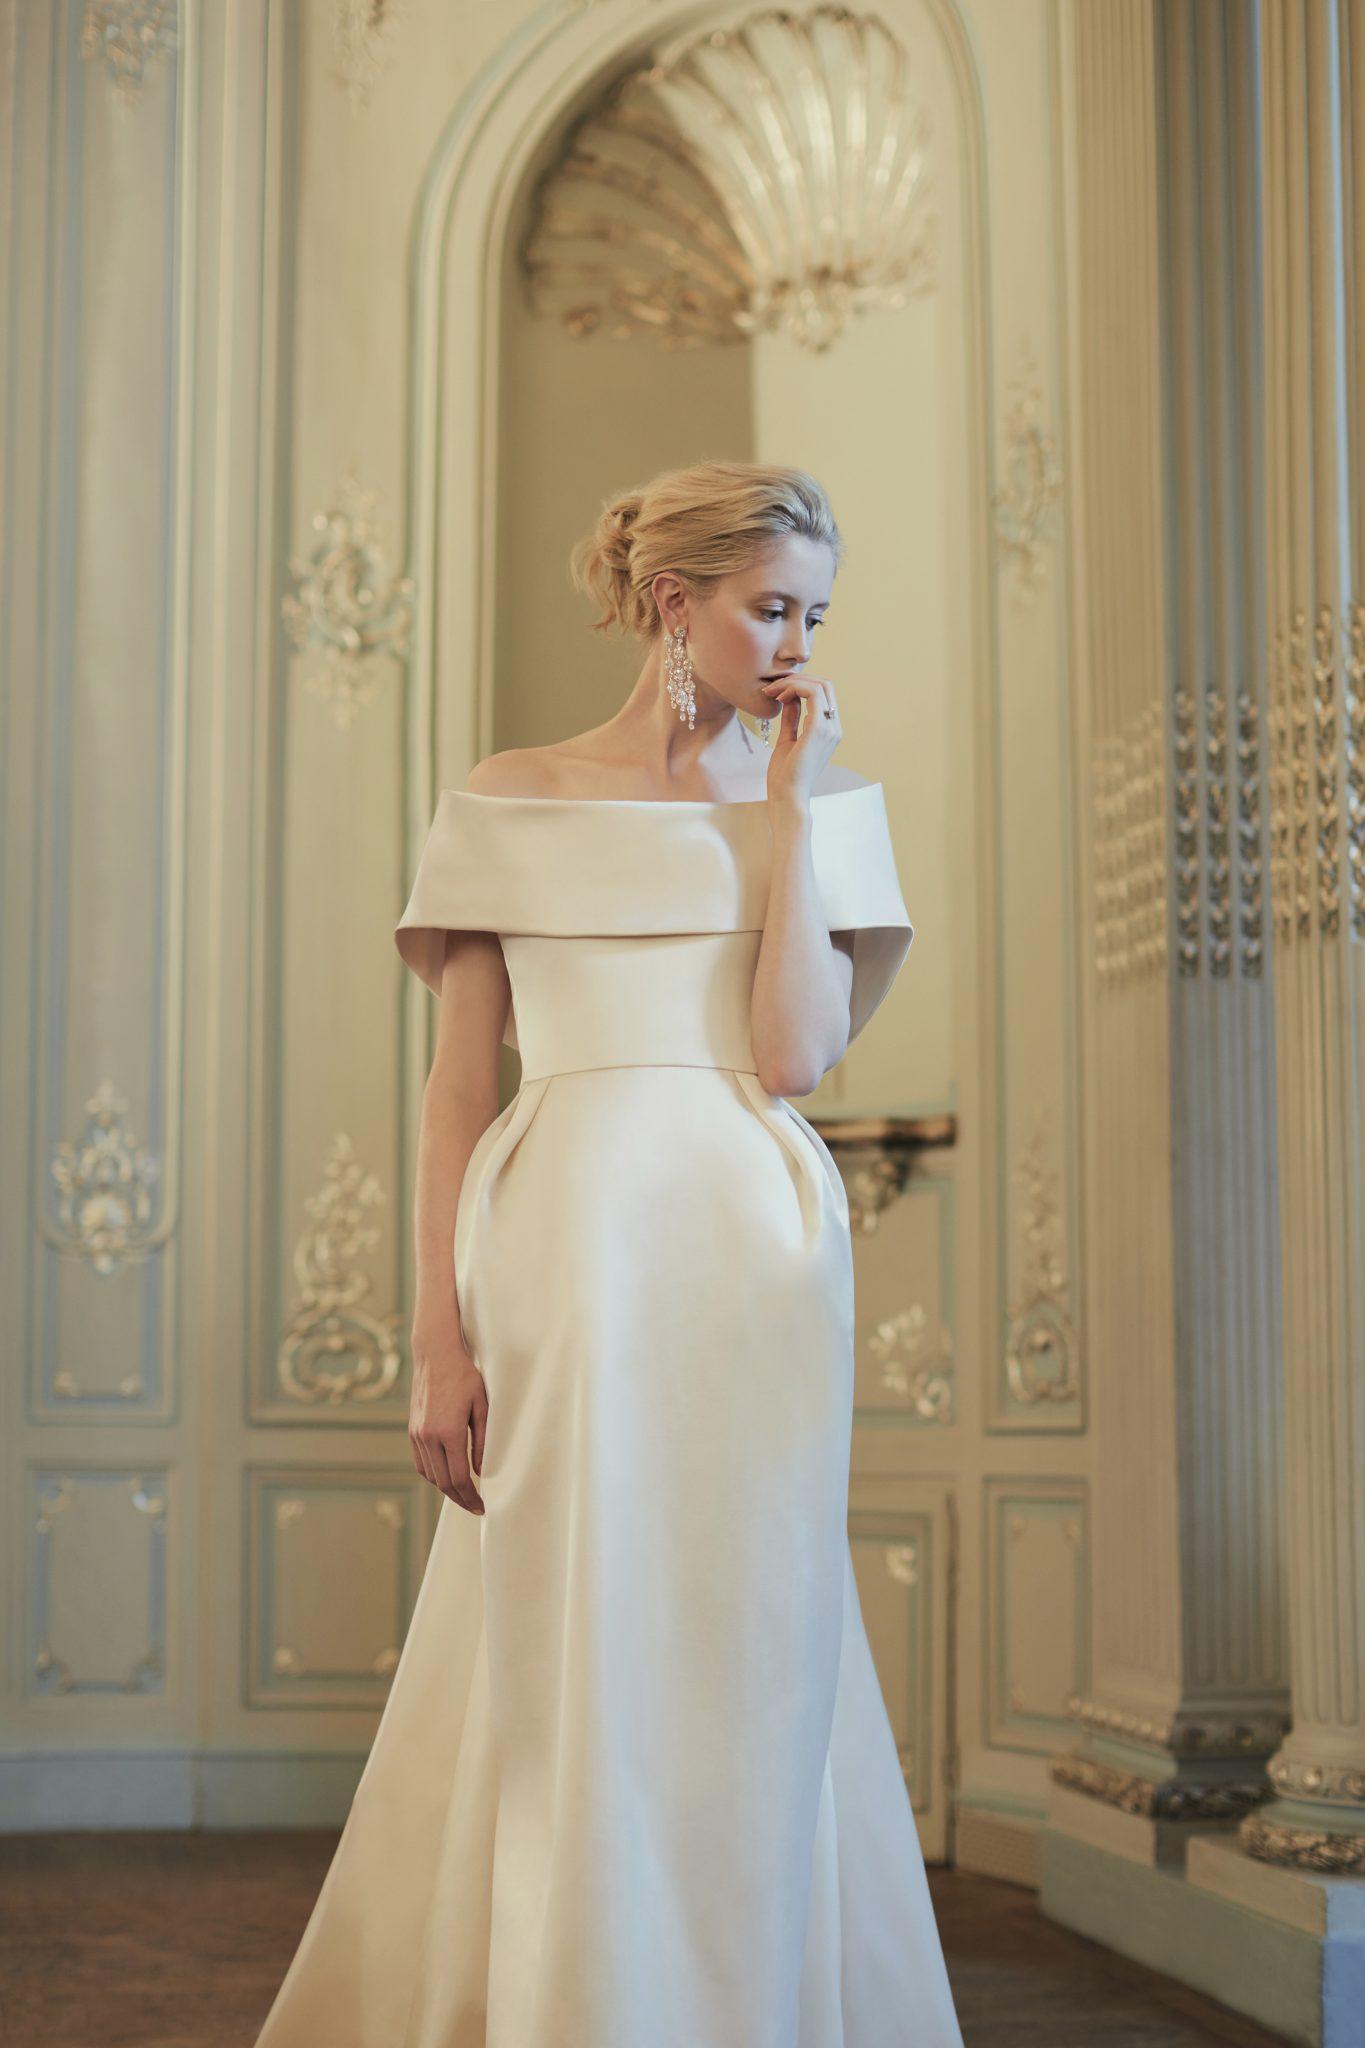 Phillipa Lepley Wedding Dress off the Shoulder